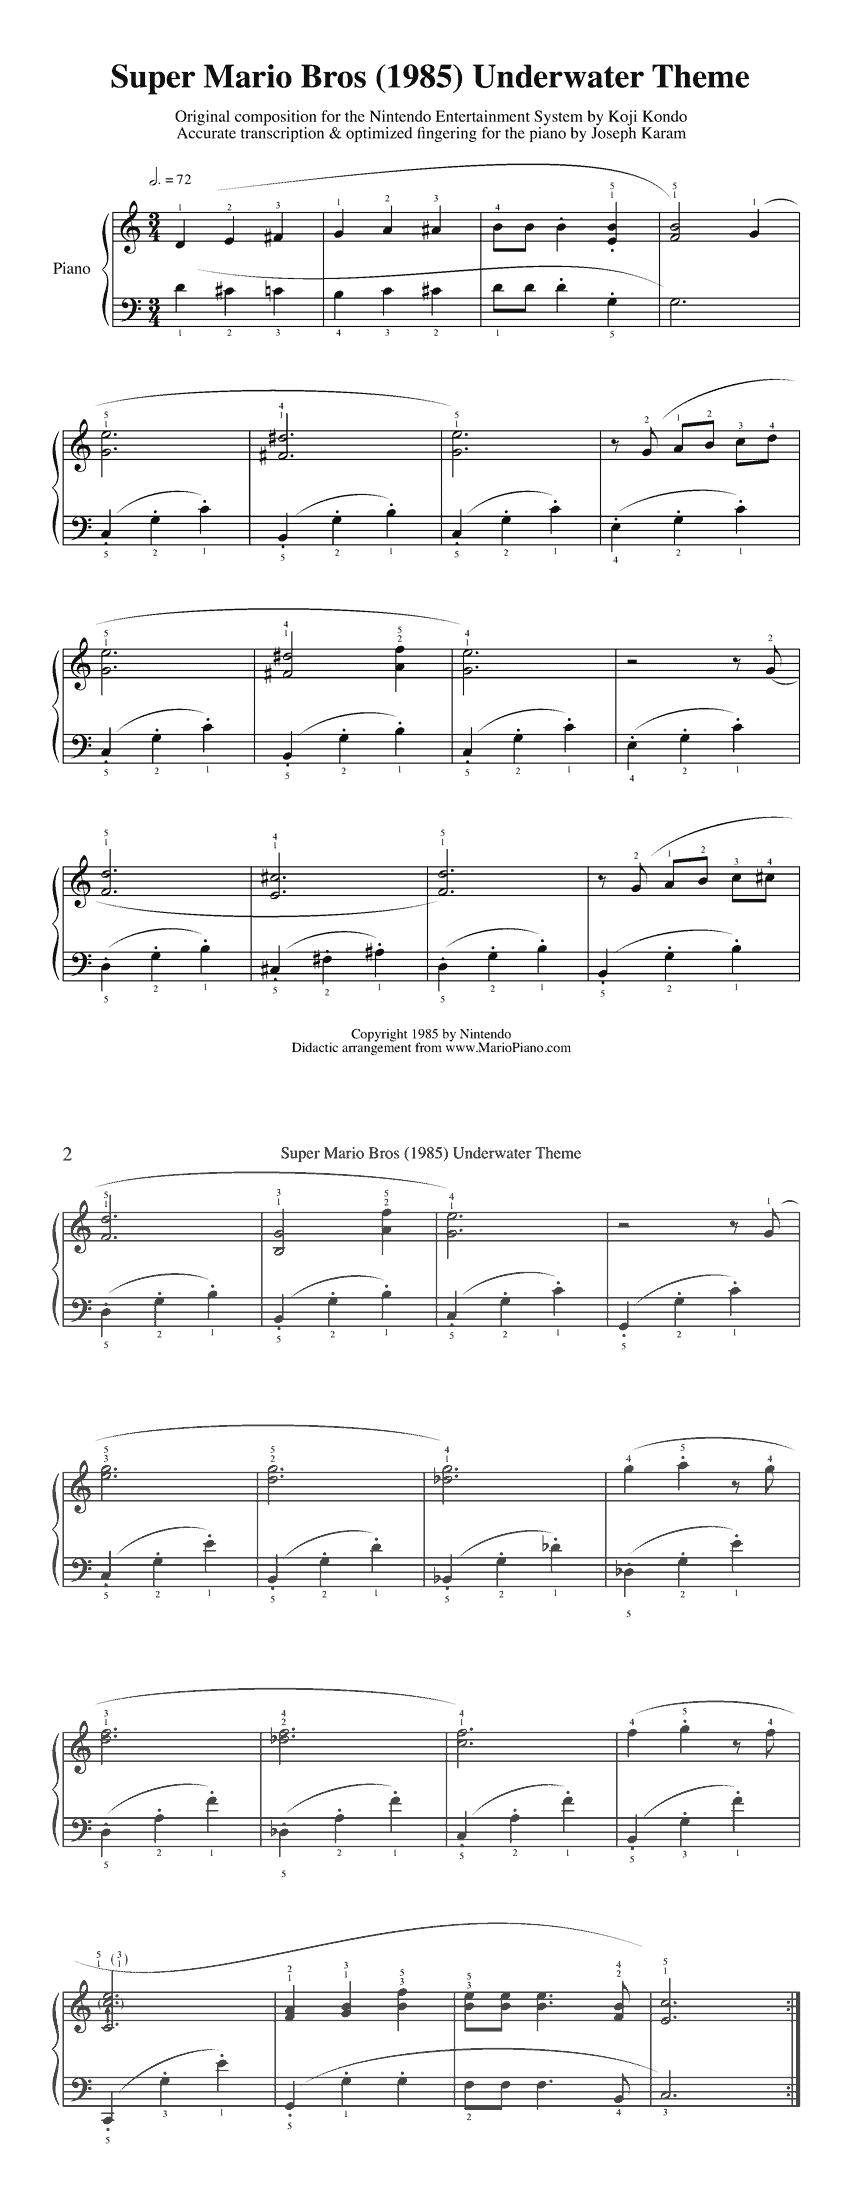 Super Mario Sheet Music | Zeldapalooza | Music, Clarinet Sheet Music - Free Printable Clarinet Sheet Music